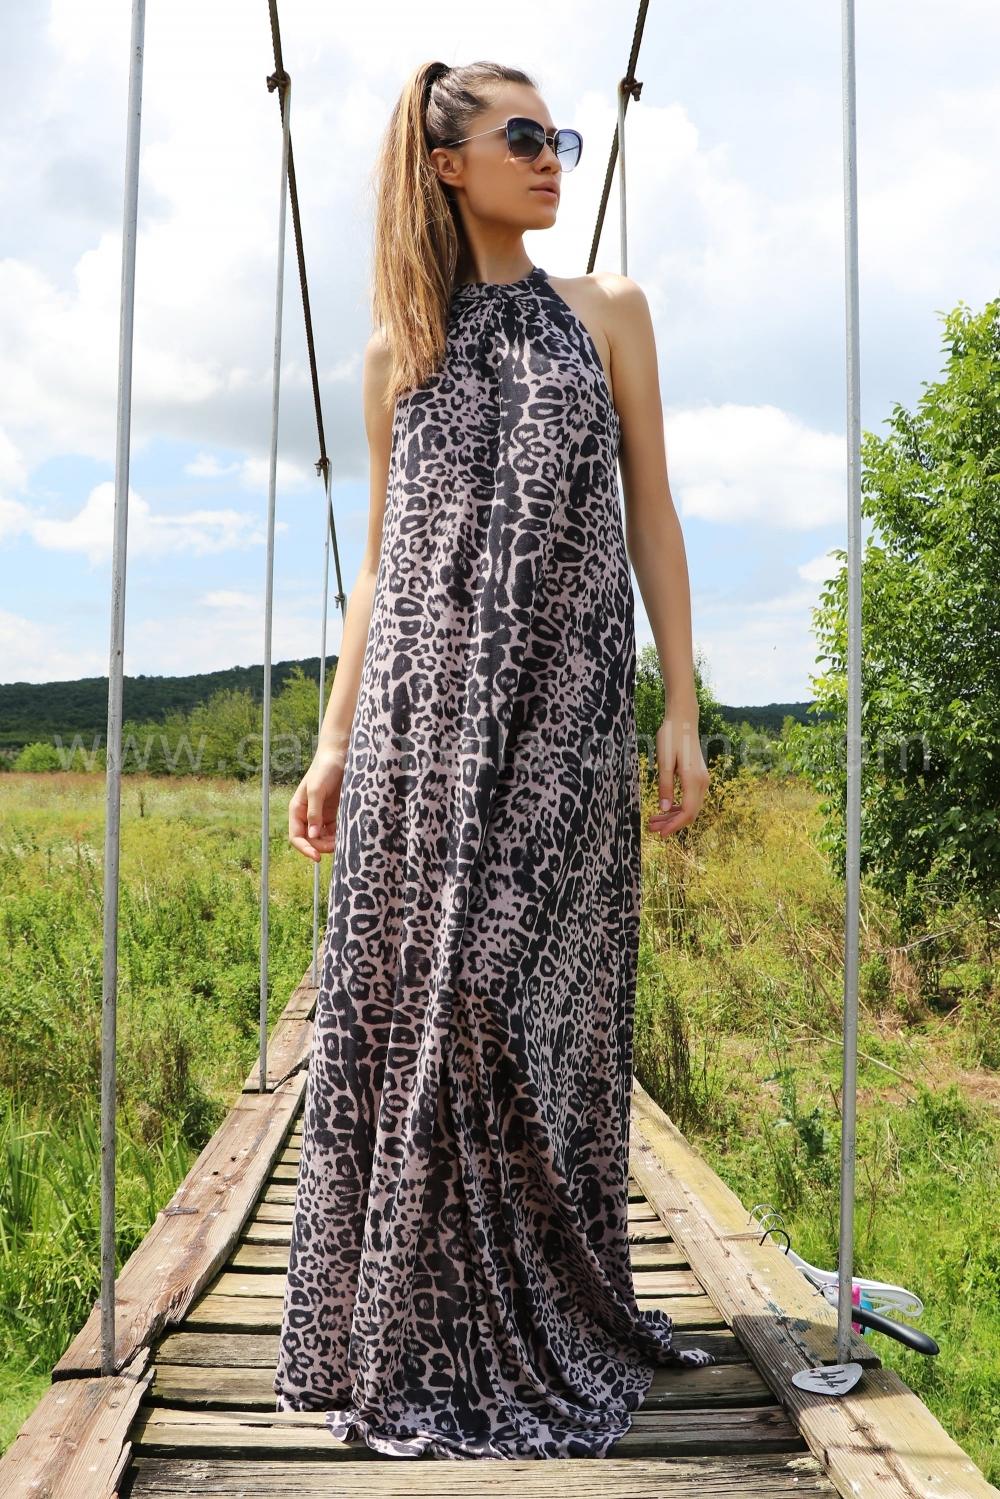 b73622ed2128 Dress Leopard Summer 012352 at the best price - Caramella Fashion